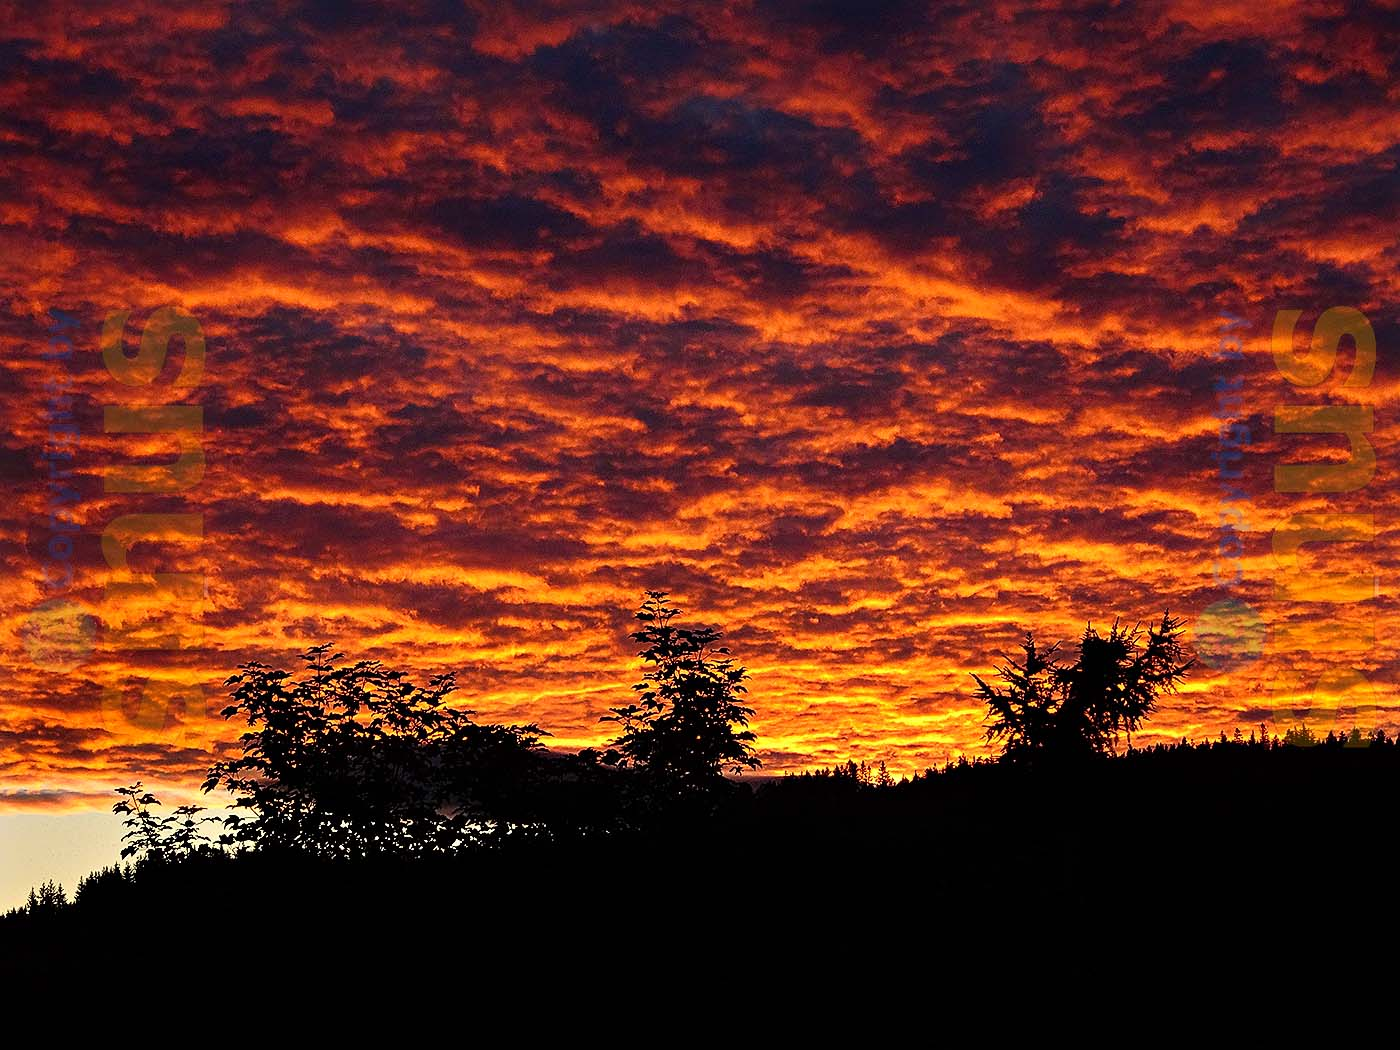 Wolkenhimmel in der Abendsonne